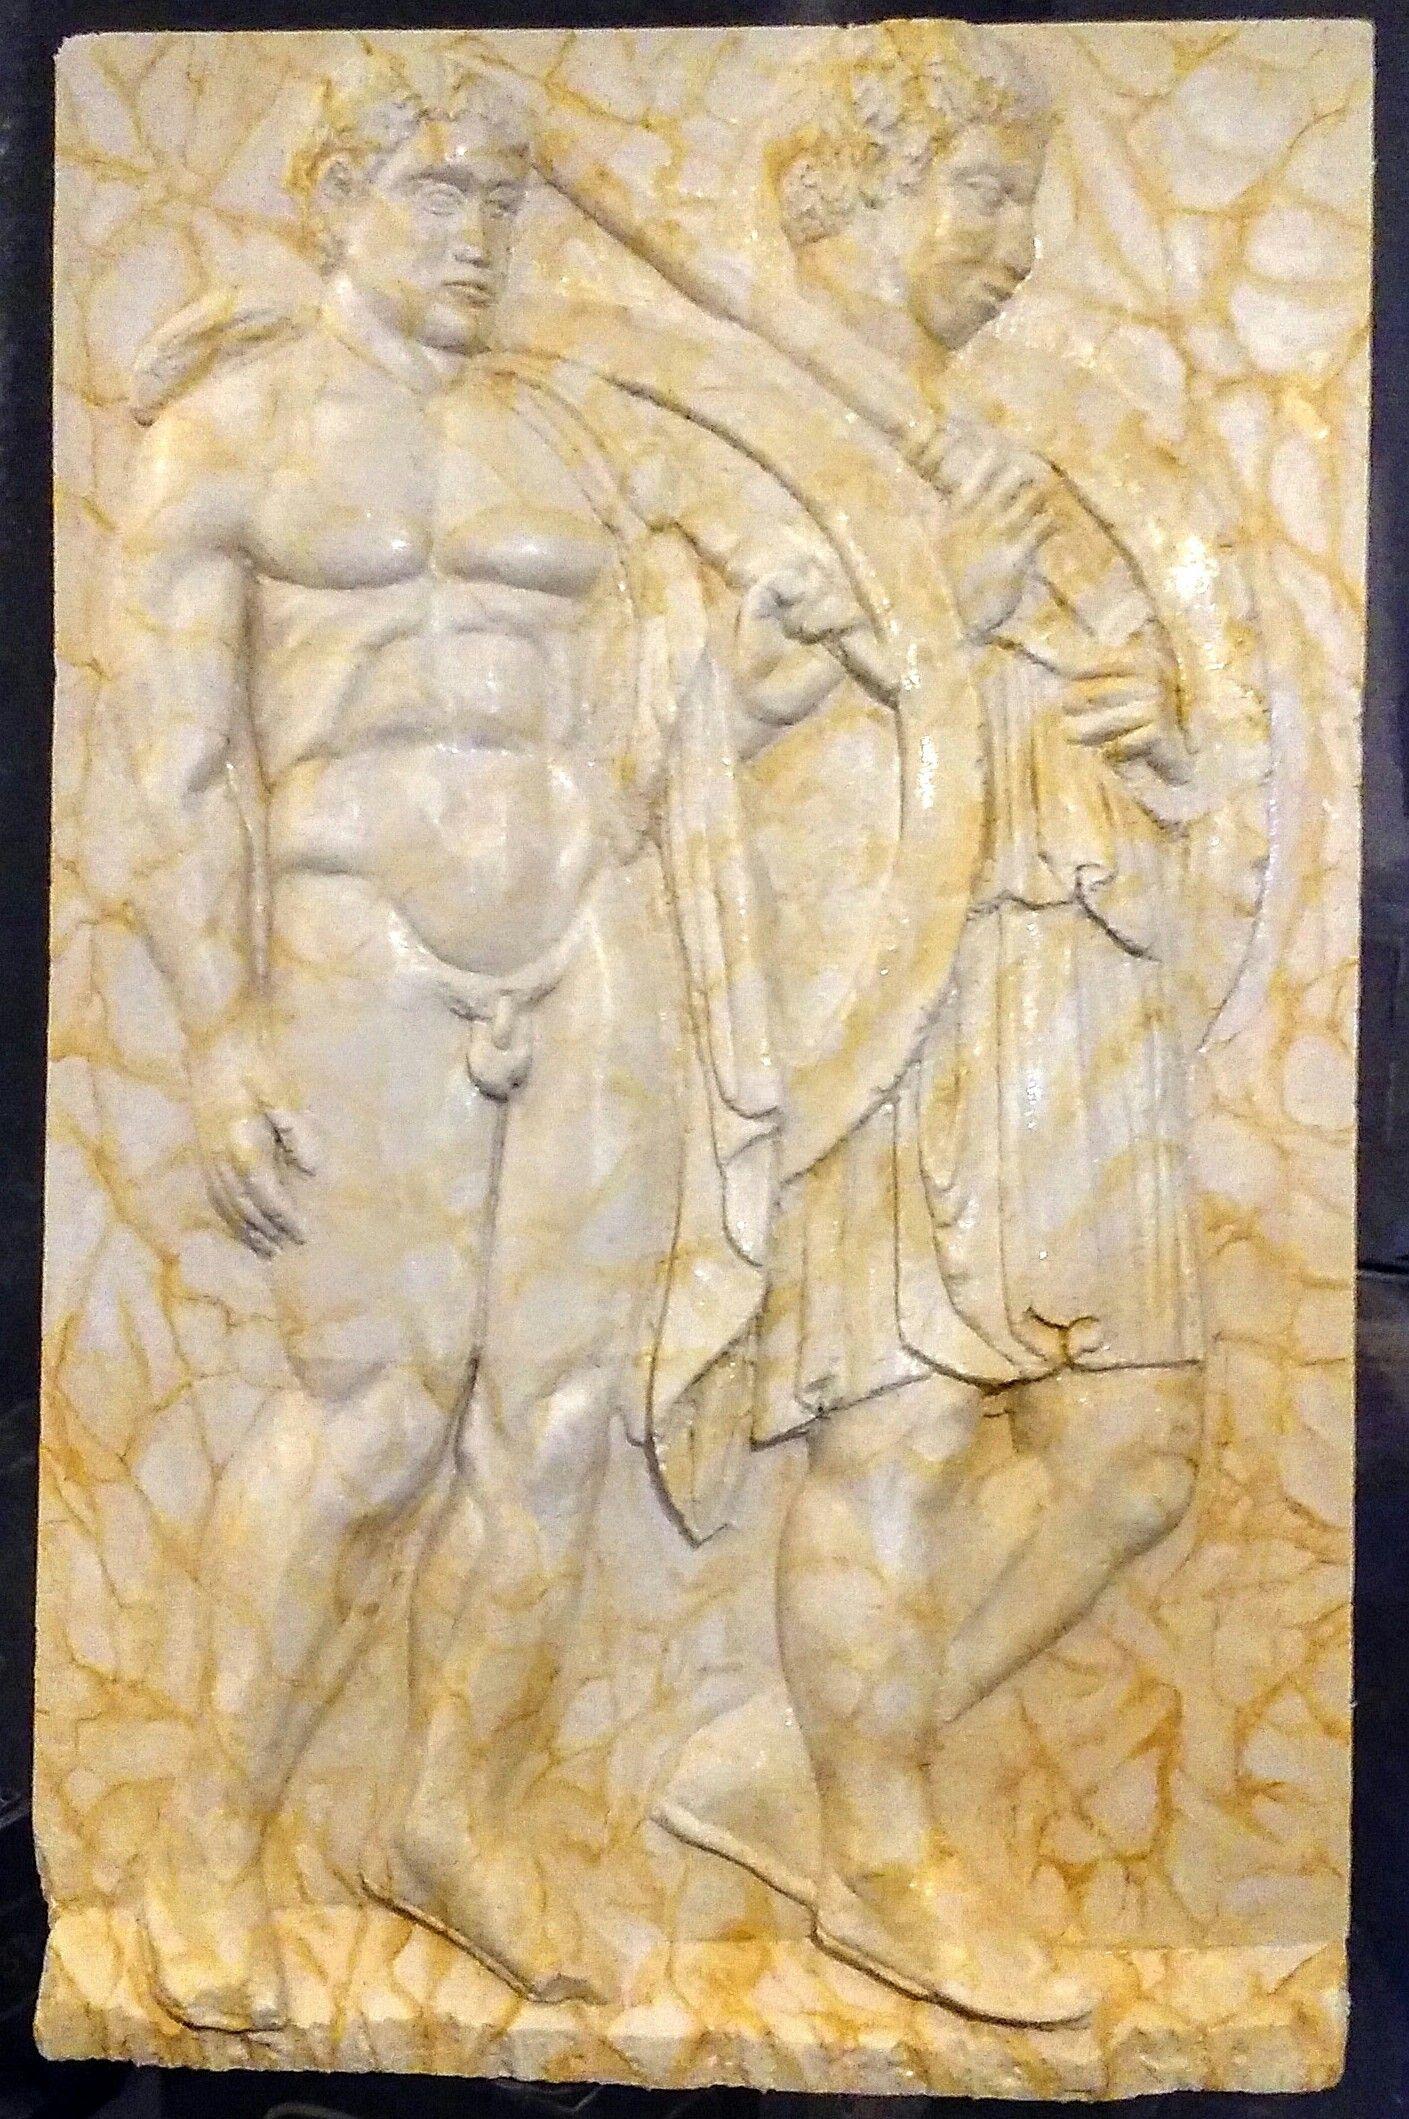 M s de 25 ideas incre bles sobre poliuretano expandido en - Pintura imitacion piedra ...